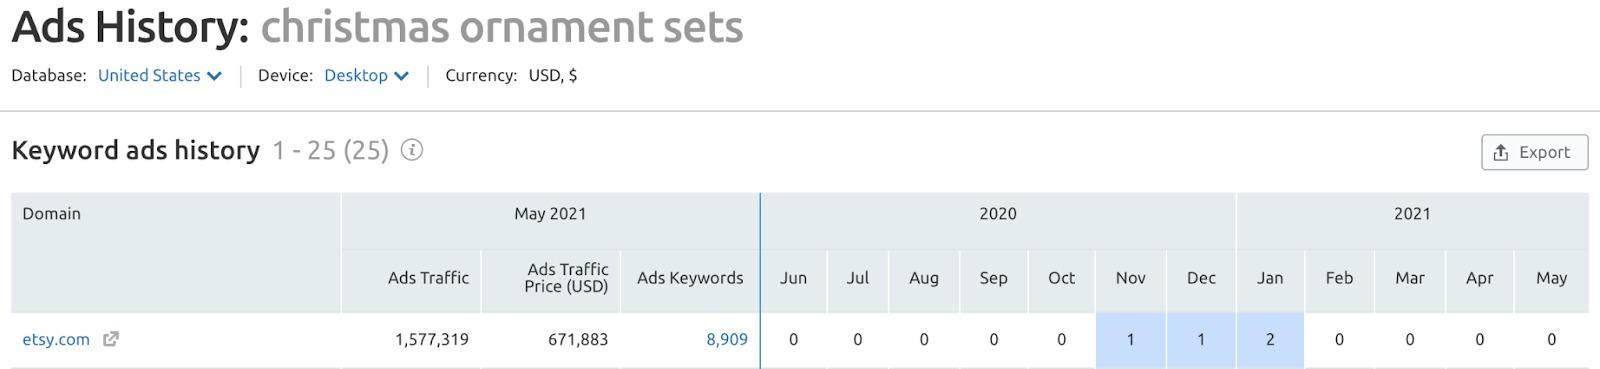 Keyword Analytics Ads History Report image 3